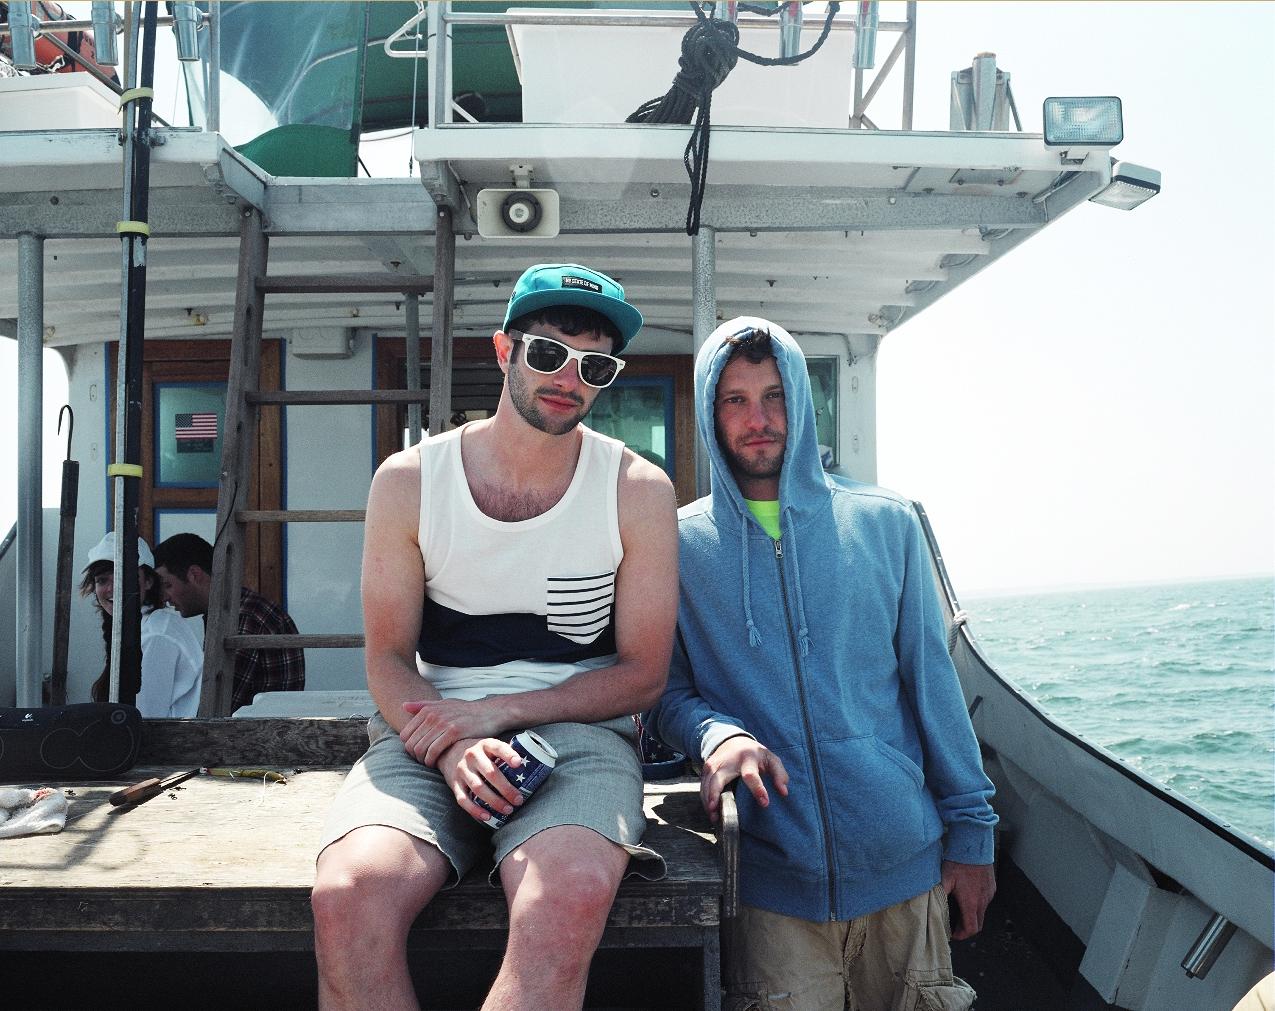 MTK_boat_4.jpg